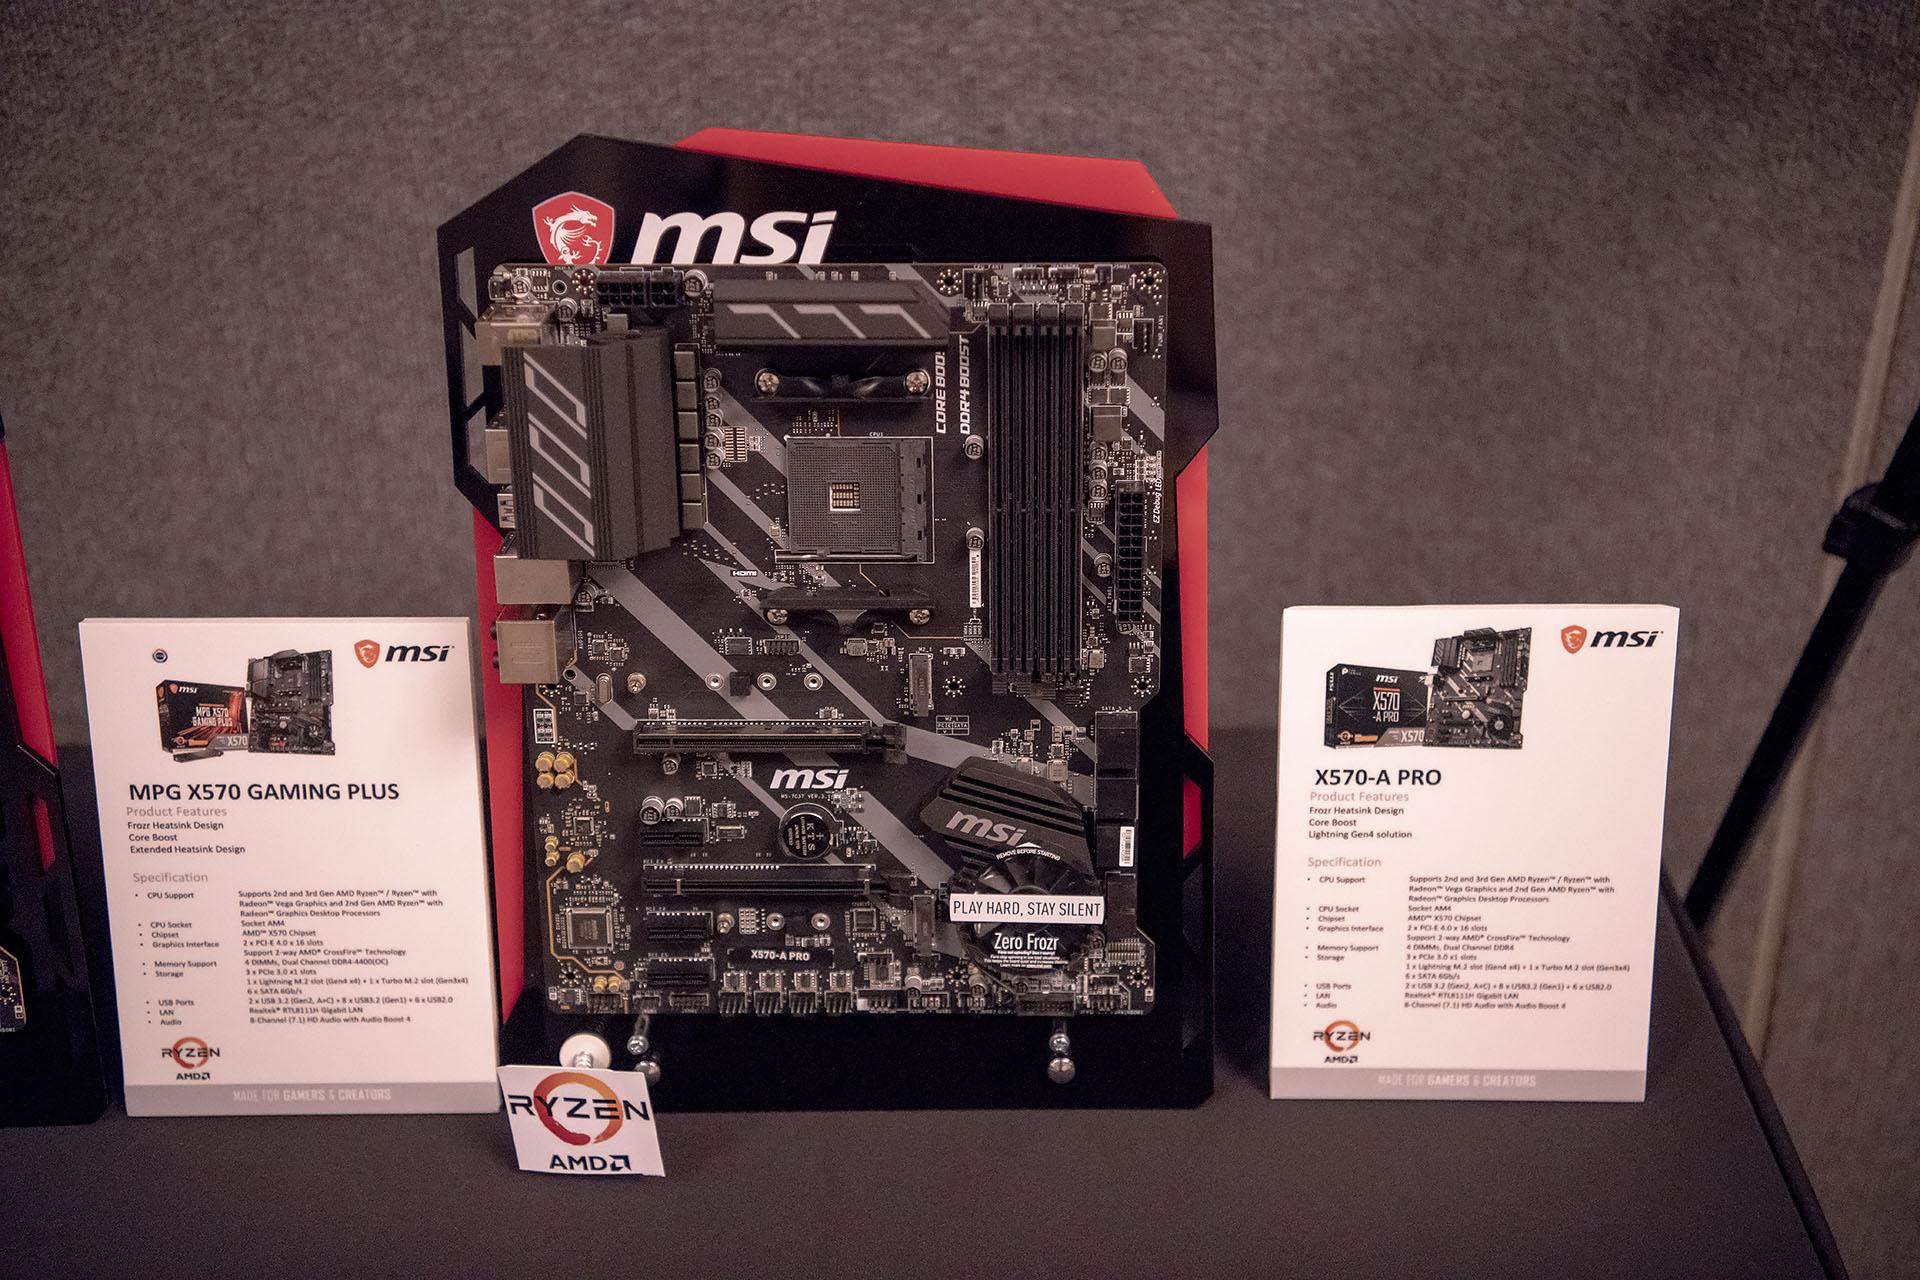 dsc 4758 บรรยากาศงาน MSI Indo Pacific X570 Partner Convention พบการเปิดตัวเมนบอร์ด X570 รุ่นใหม่ล่าสุดจากทาง MSI ต้อนรับการมาของซีพียู AMD RYZEN 3000ซีรี่ย์